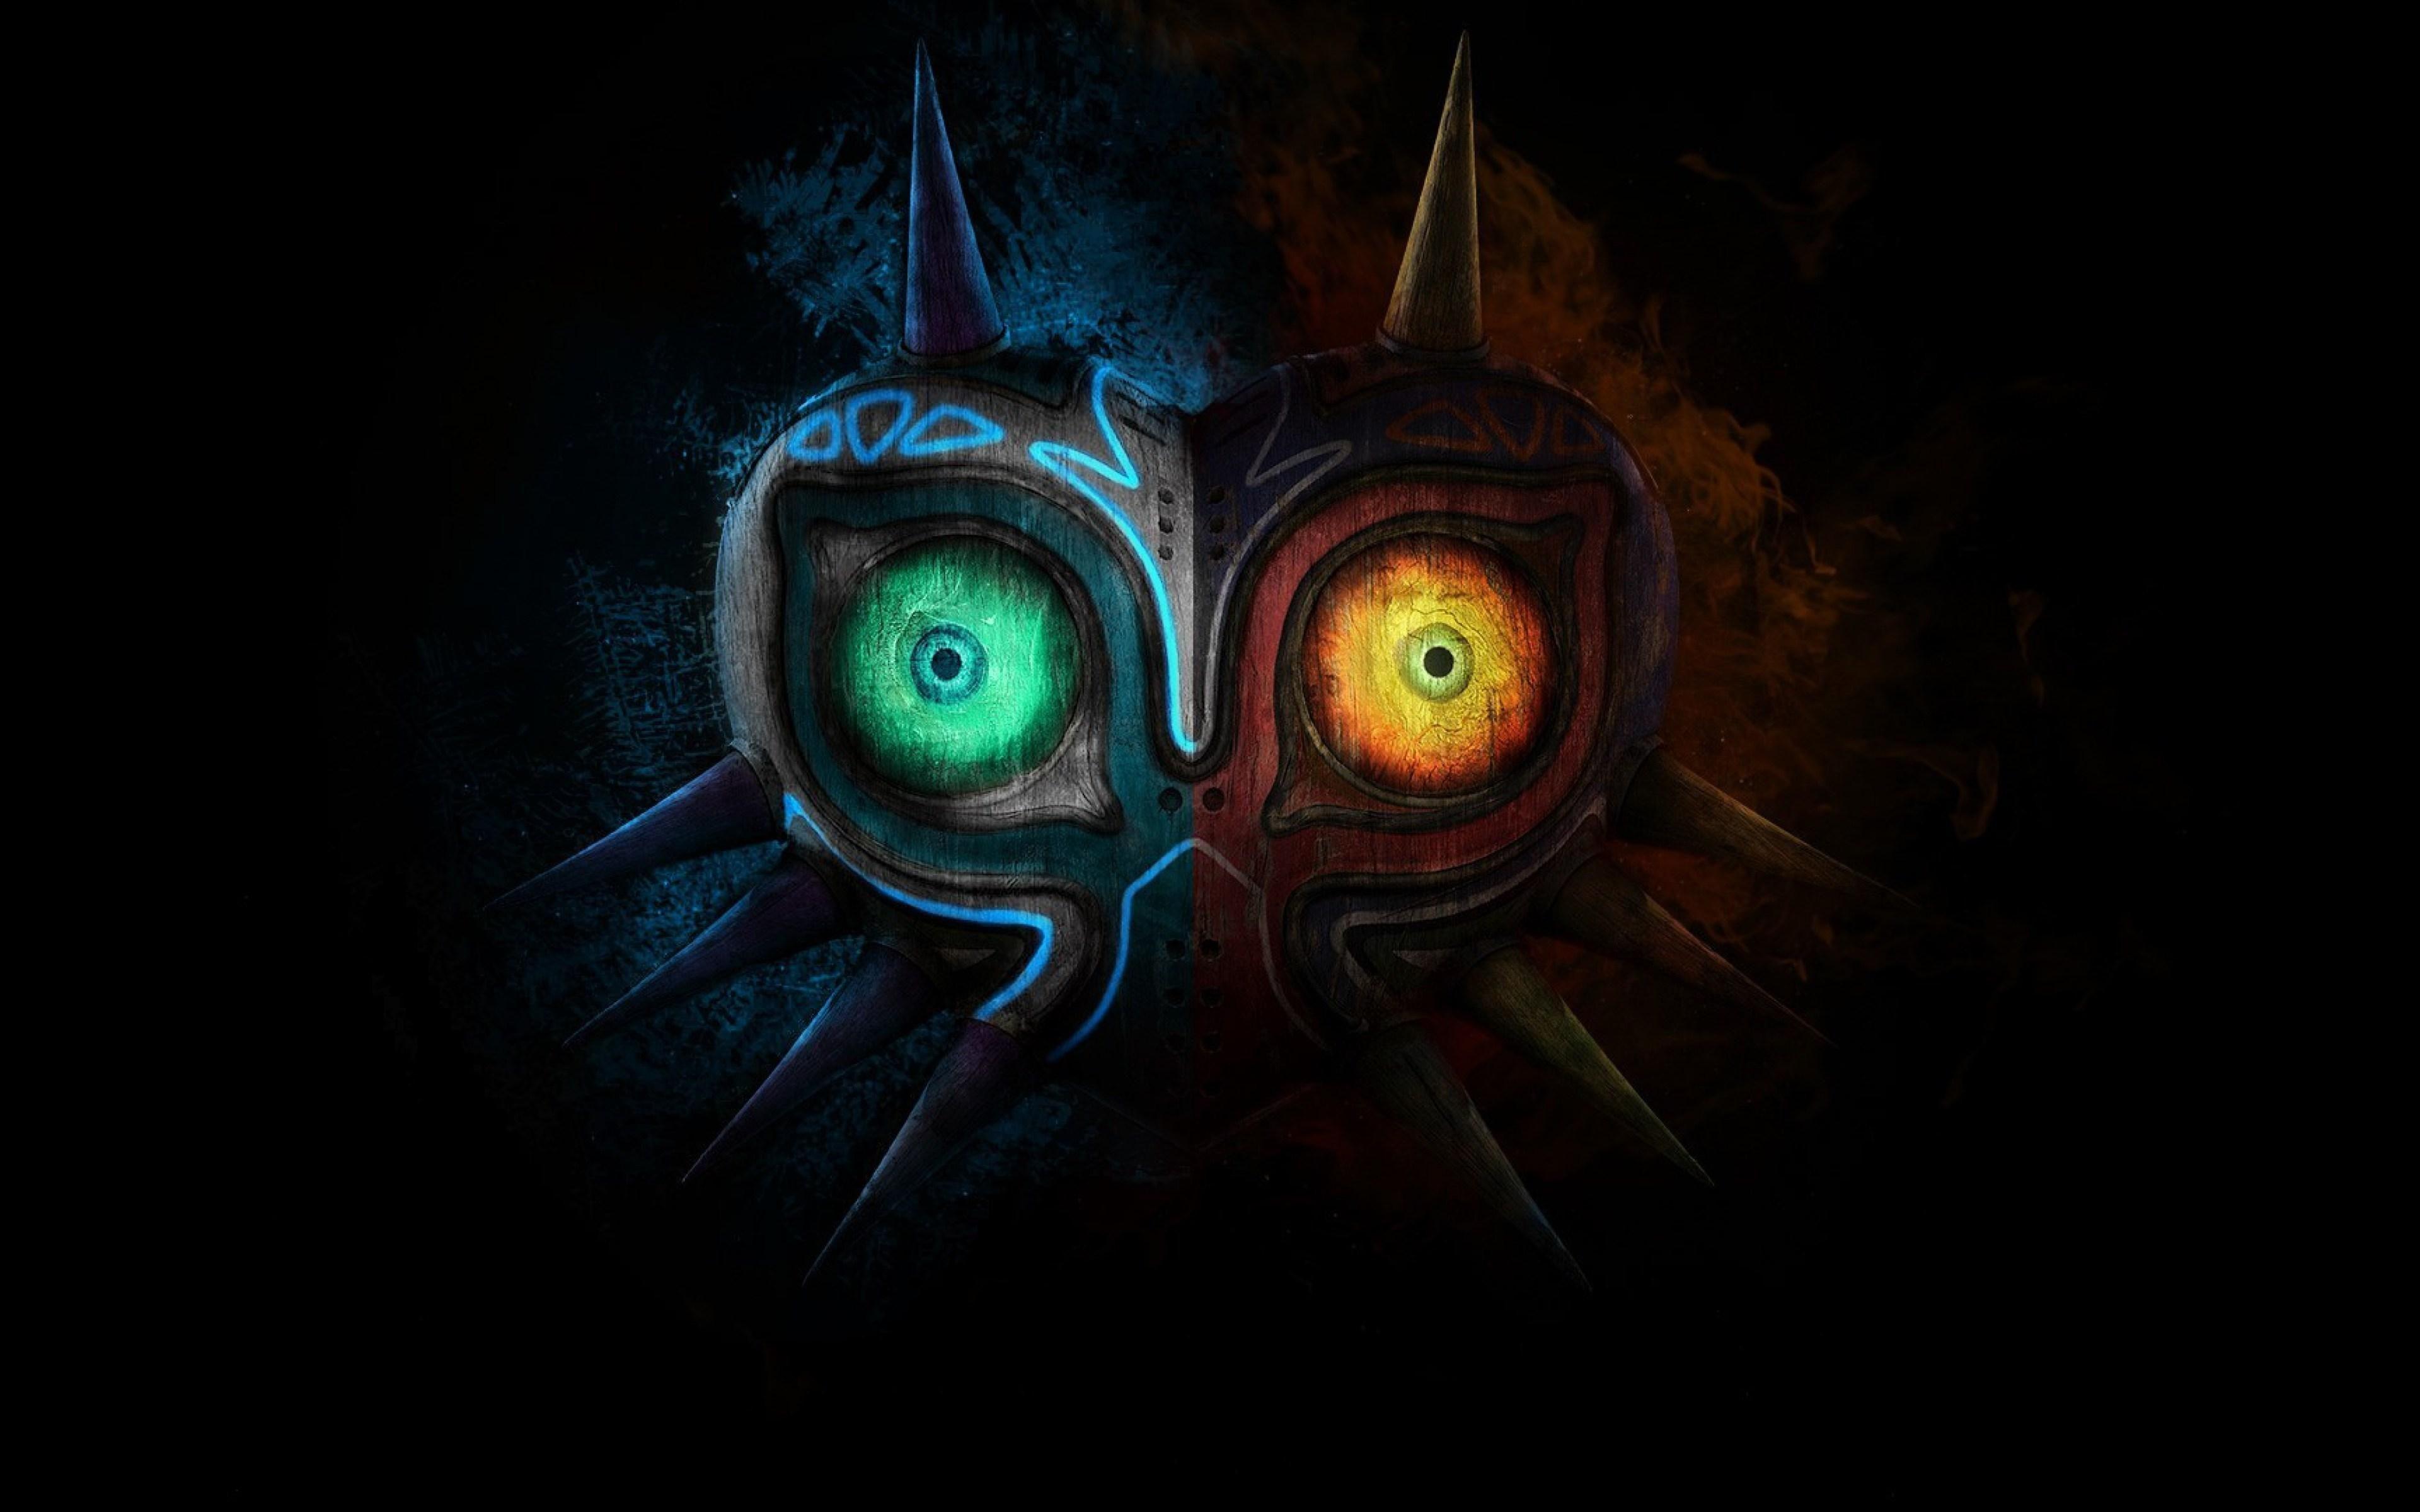 Gamer Wallpaper 4k 98533 Zelda Art Majoras Mask Art Legend Of Zelda